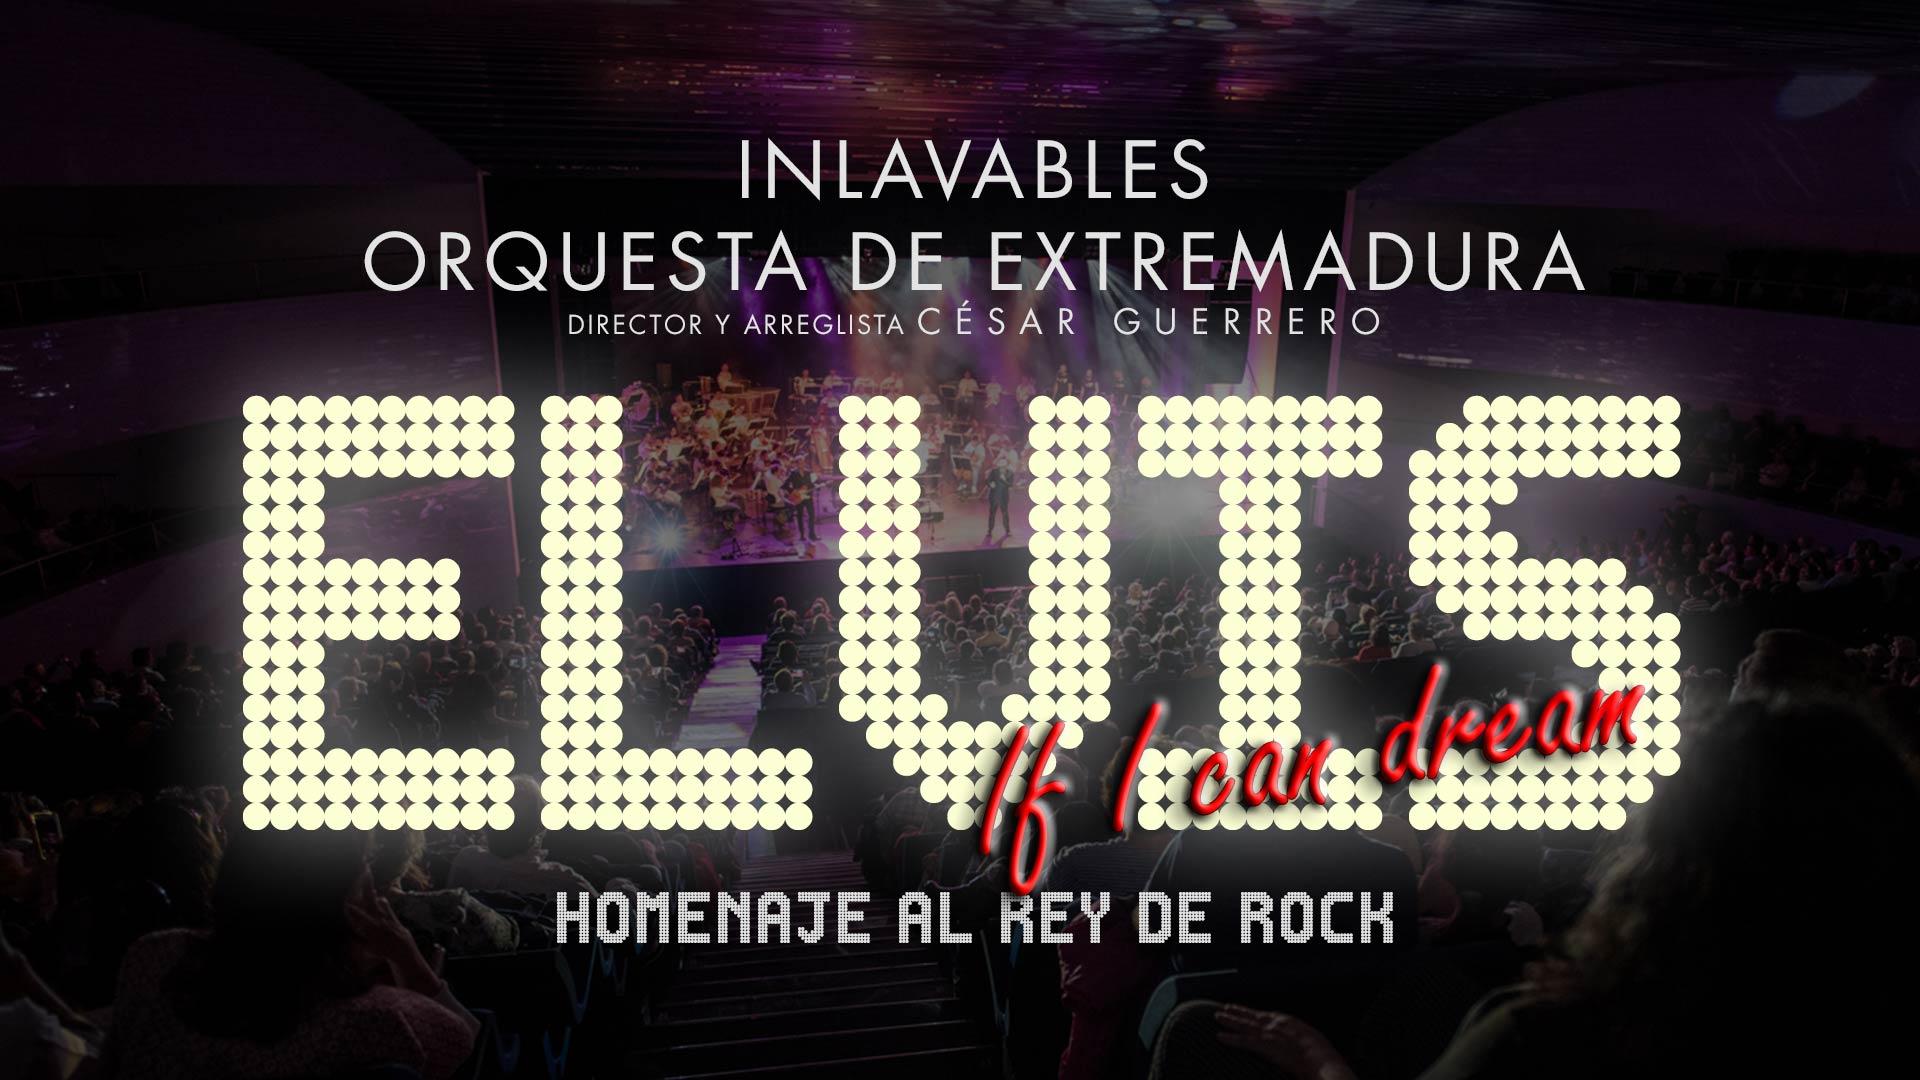 Inlavables y la OEX son Mostra Espanha en el Artes à Rua de Évora